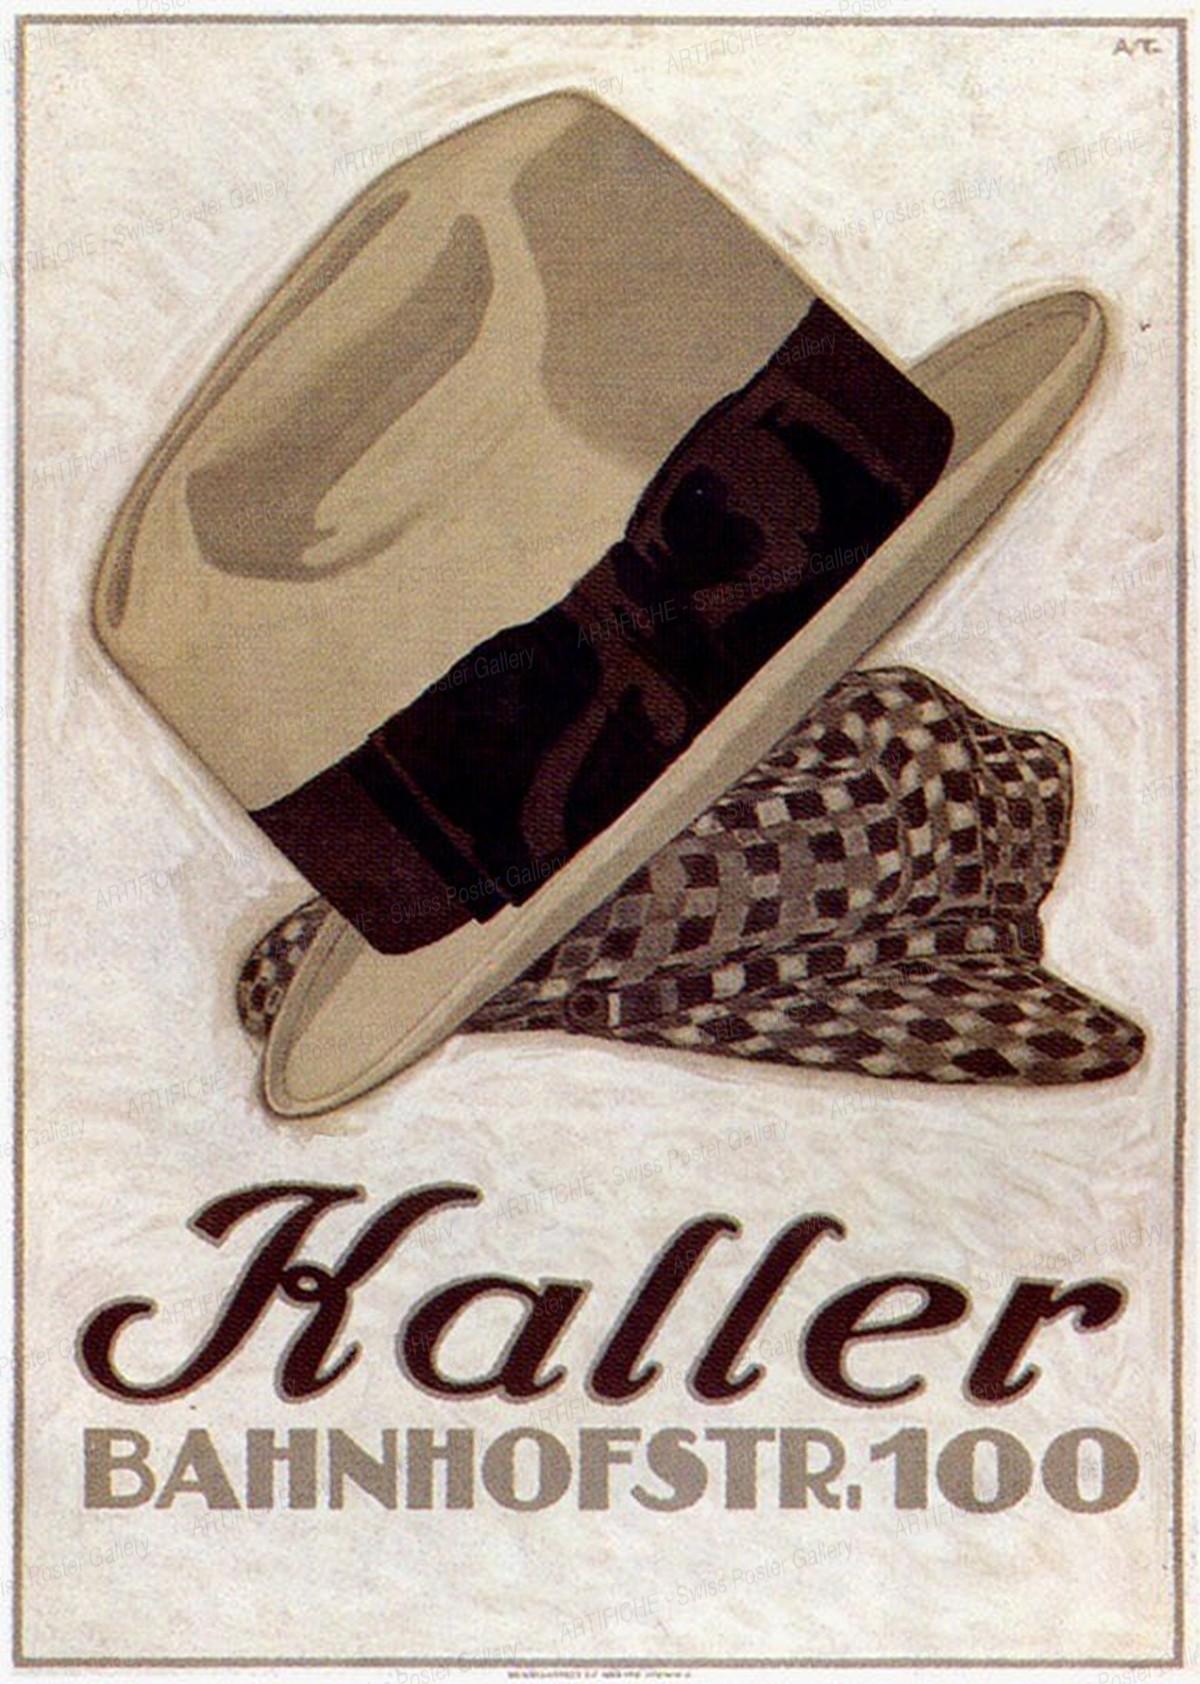 Kaller – Bahnhofstr. 100, Anton Trieb